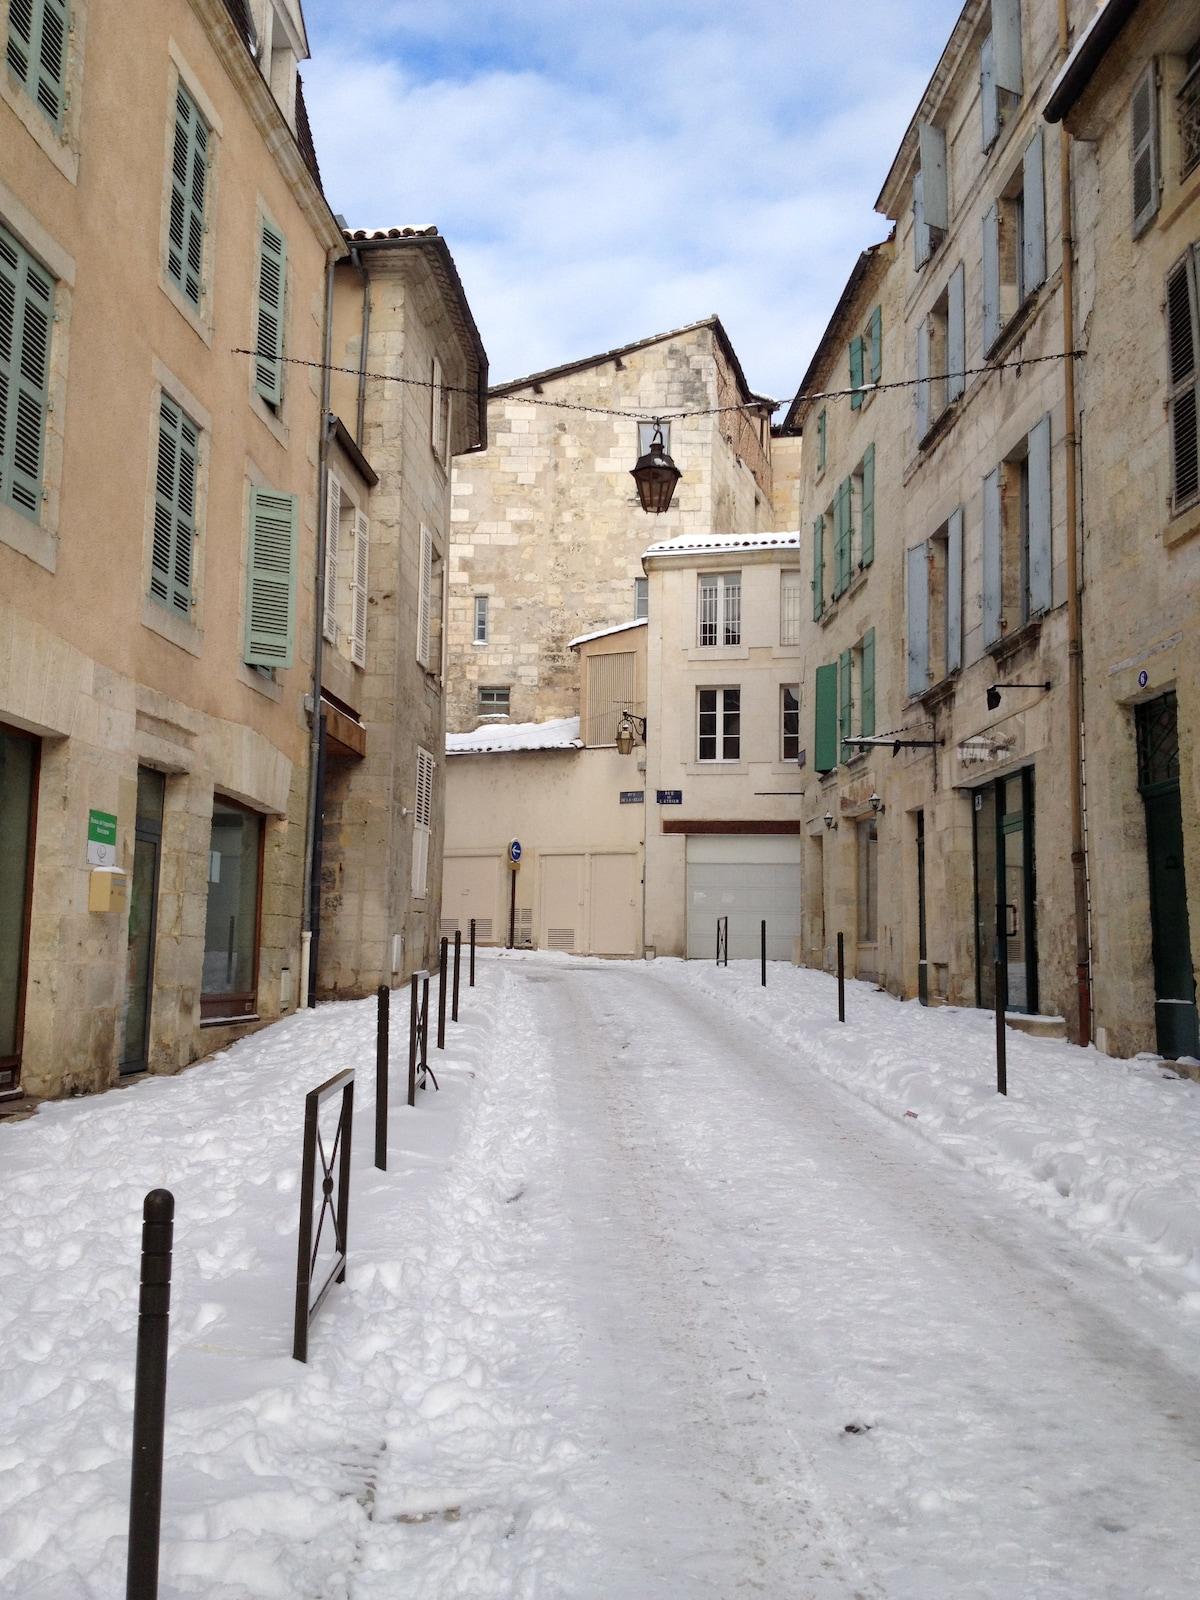 Street view in Winter